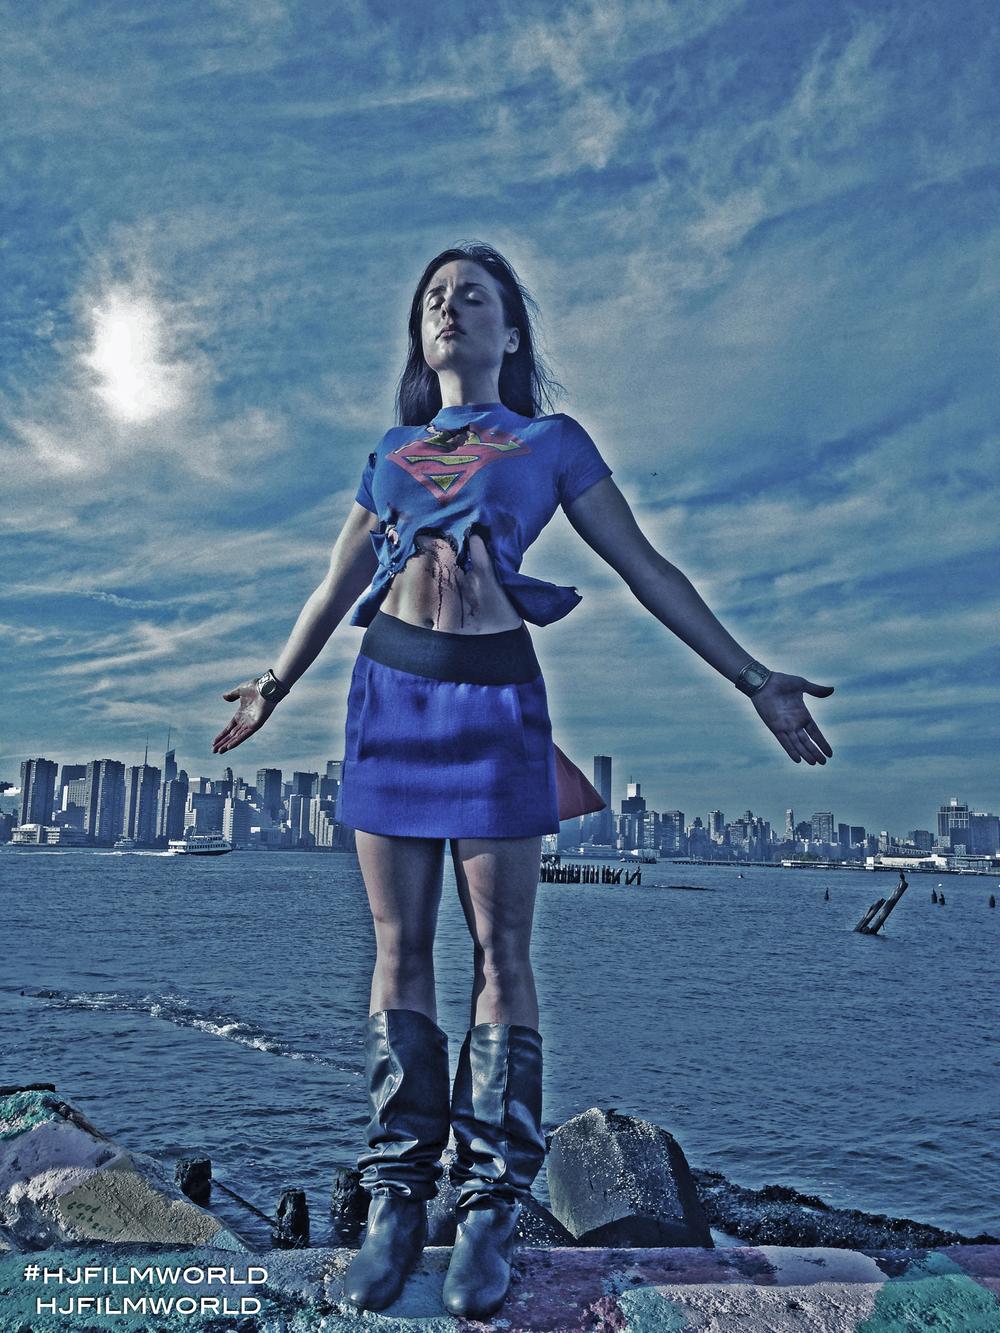 Model: Cindy Suarez